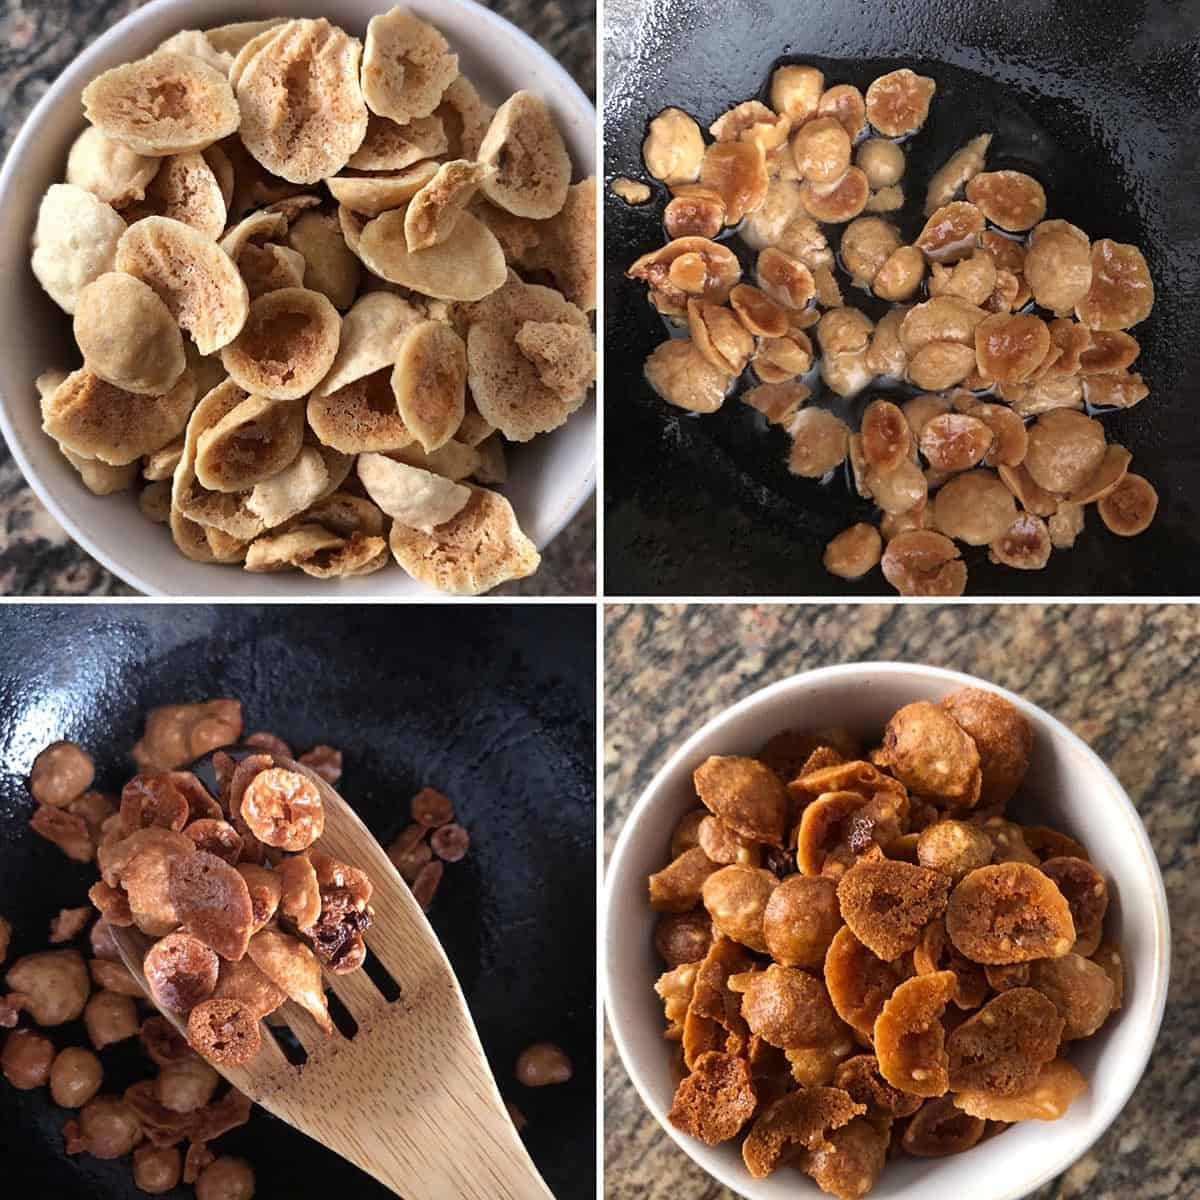 Step by step photos showing frying of lentil dumplings